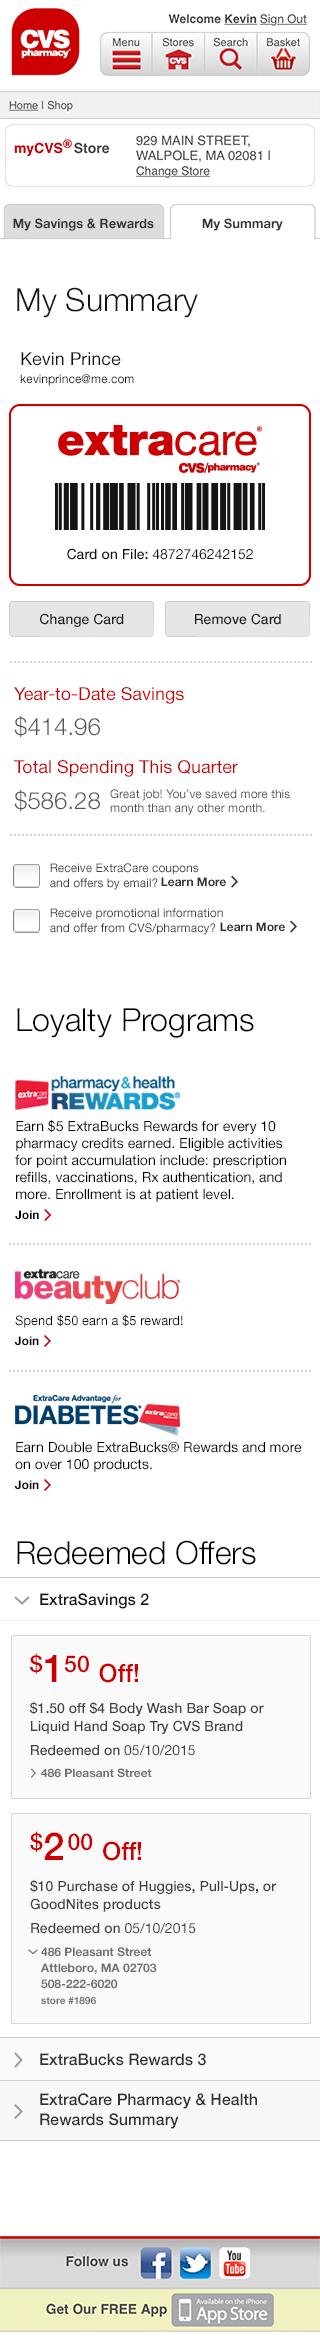 cvs extracare savings and rewards on behance